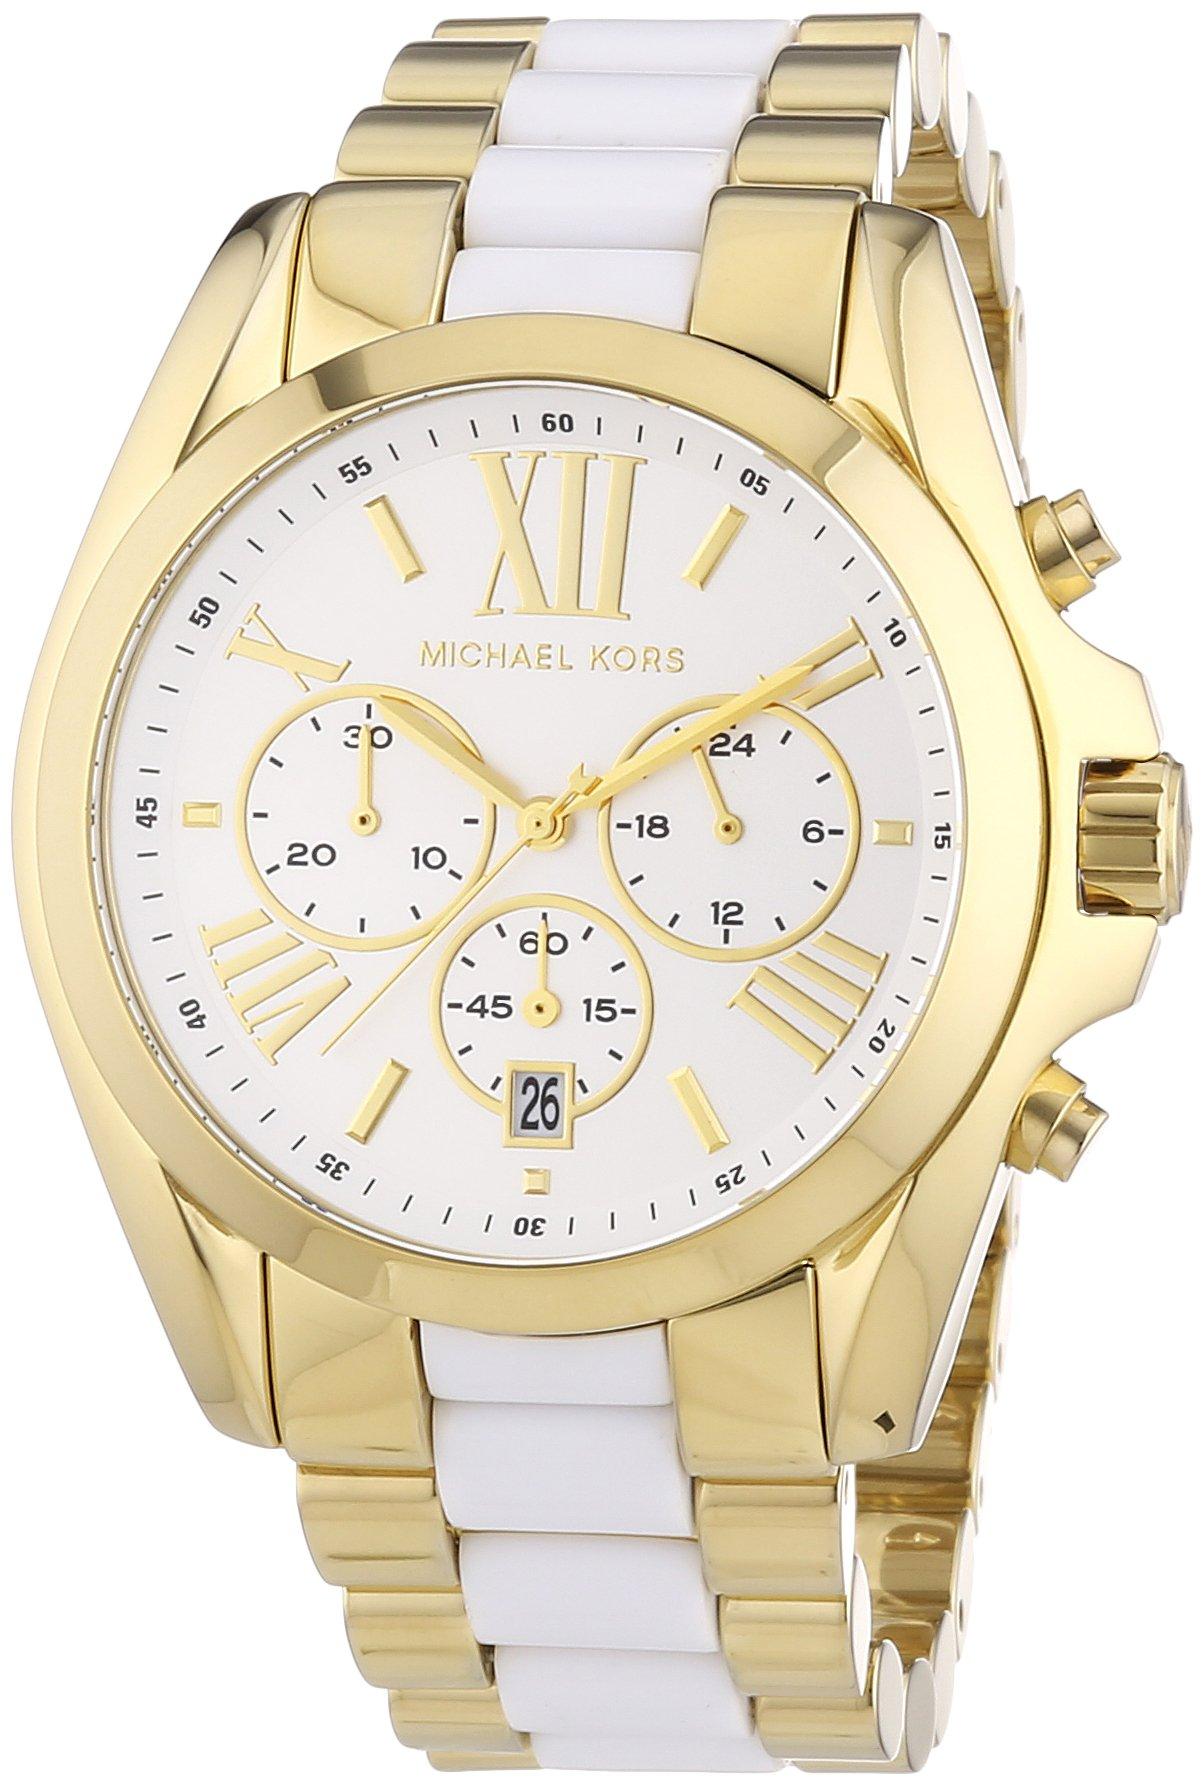 Michael Kors Women's Bradshaw Chronograph Watch, Gold, One Size by Michael Kors